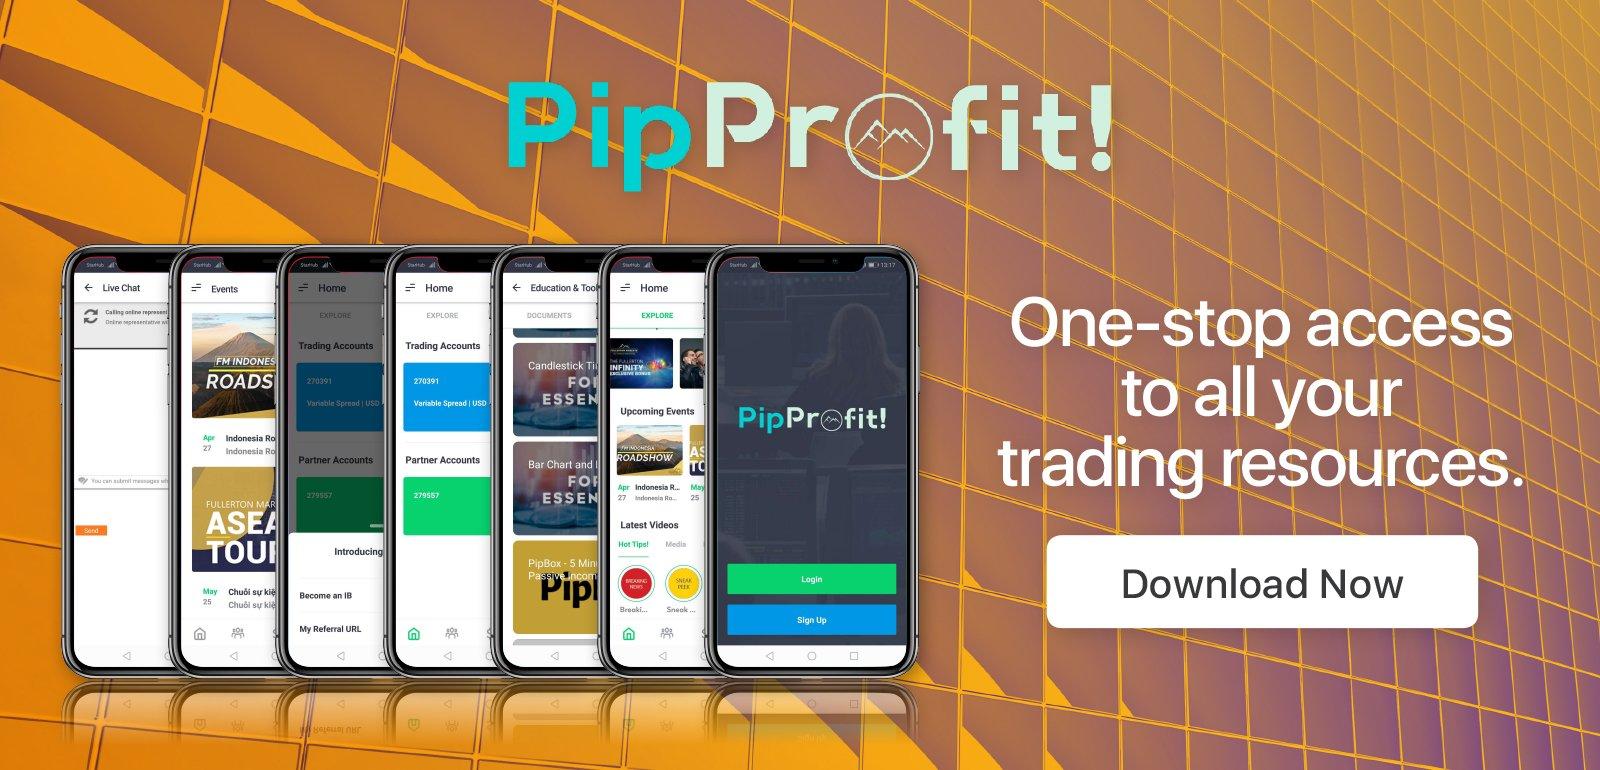 PipProfit